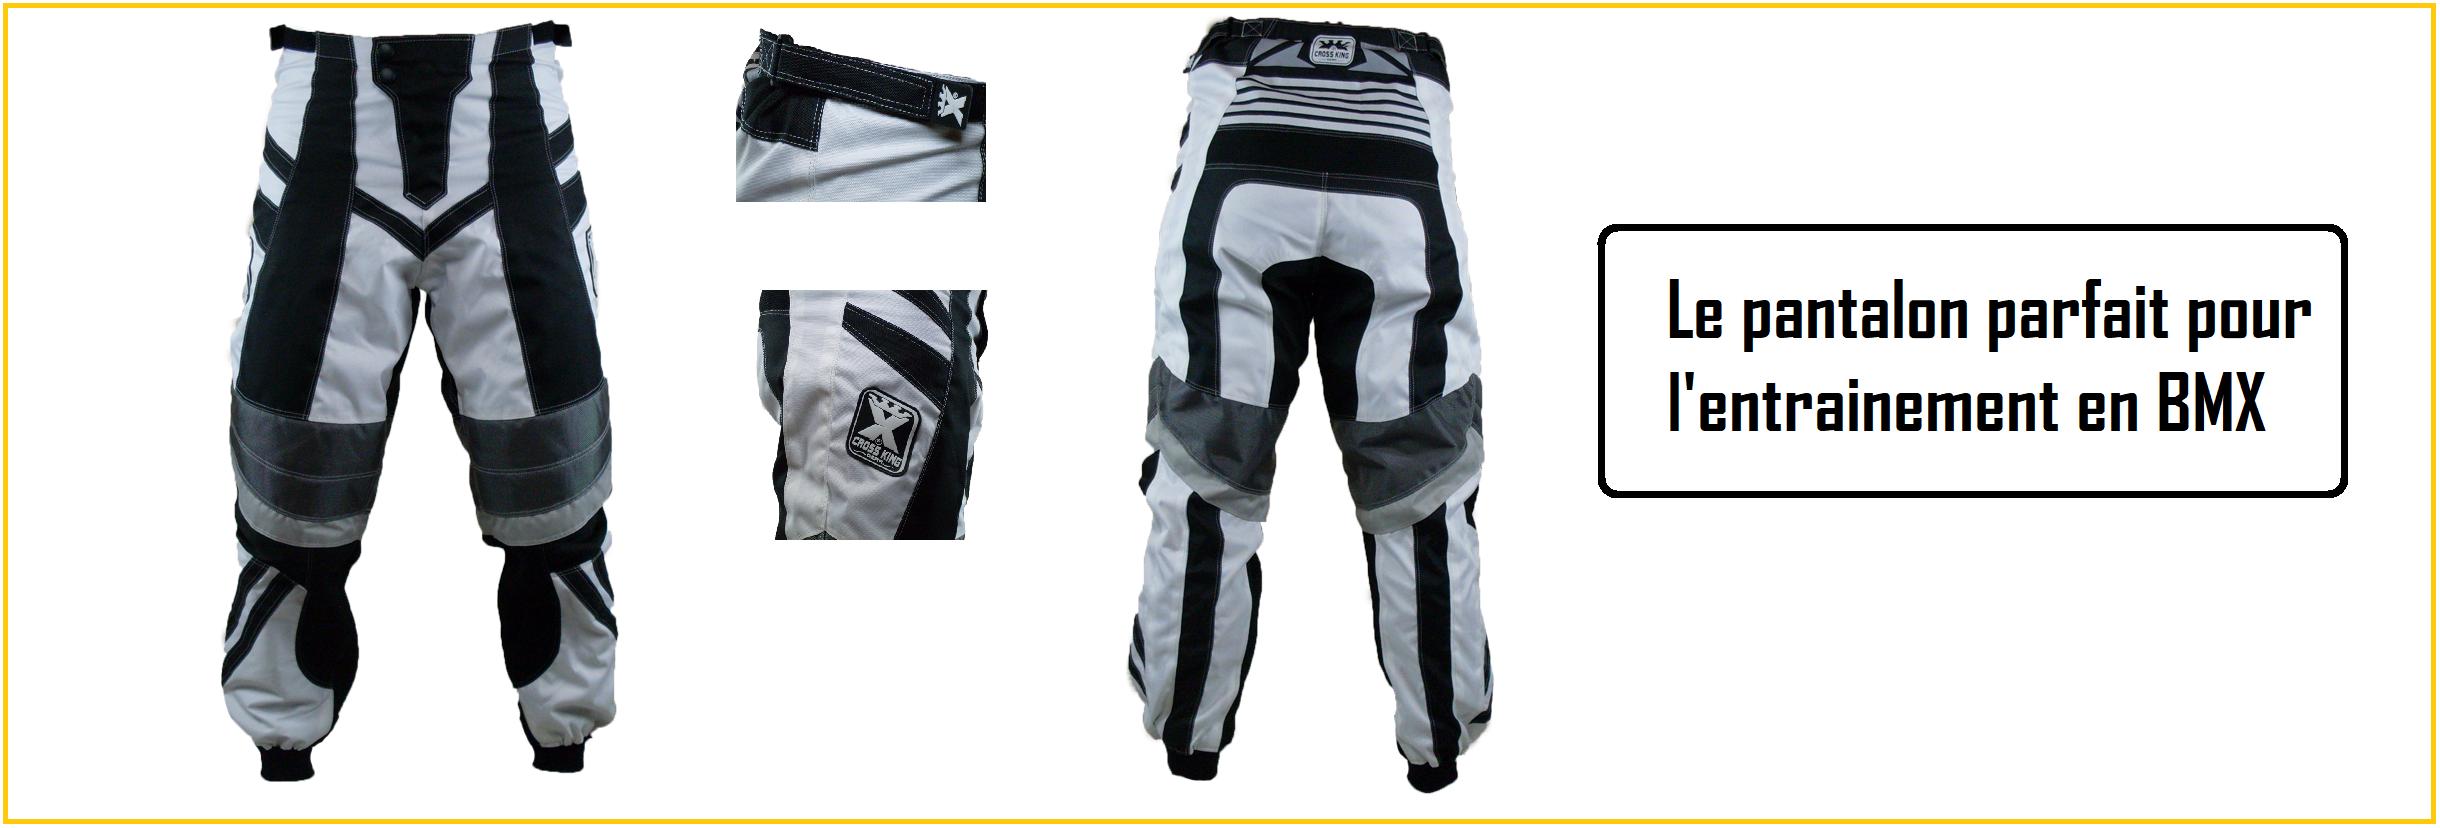 Pantalon de BMX adulte